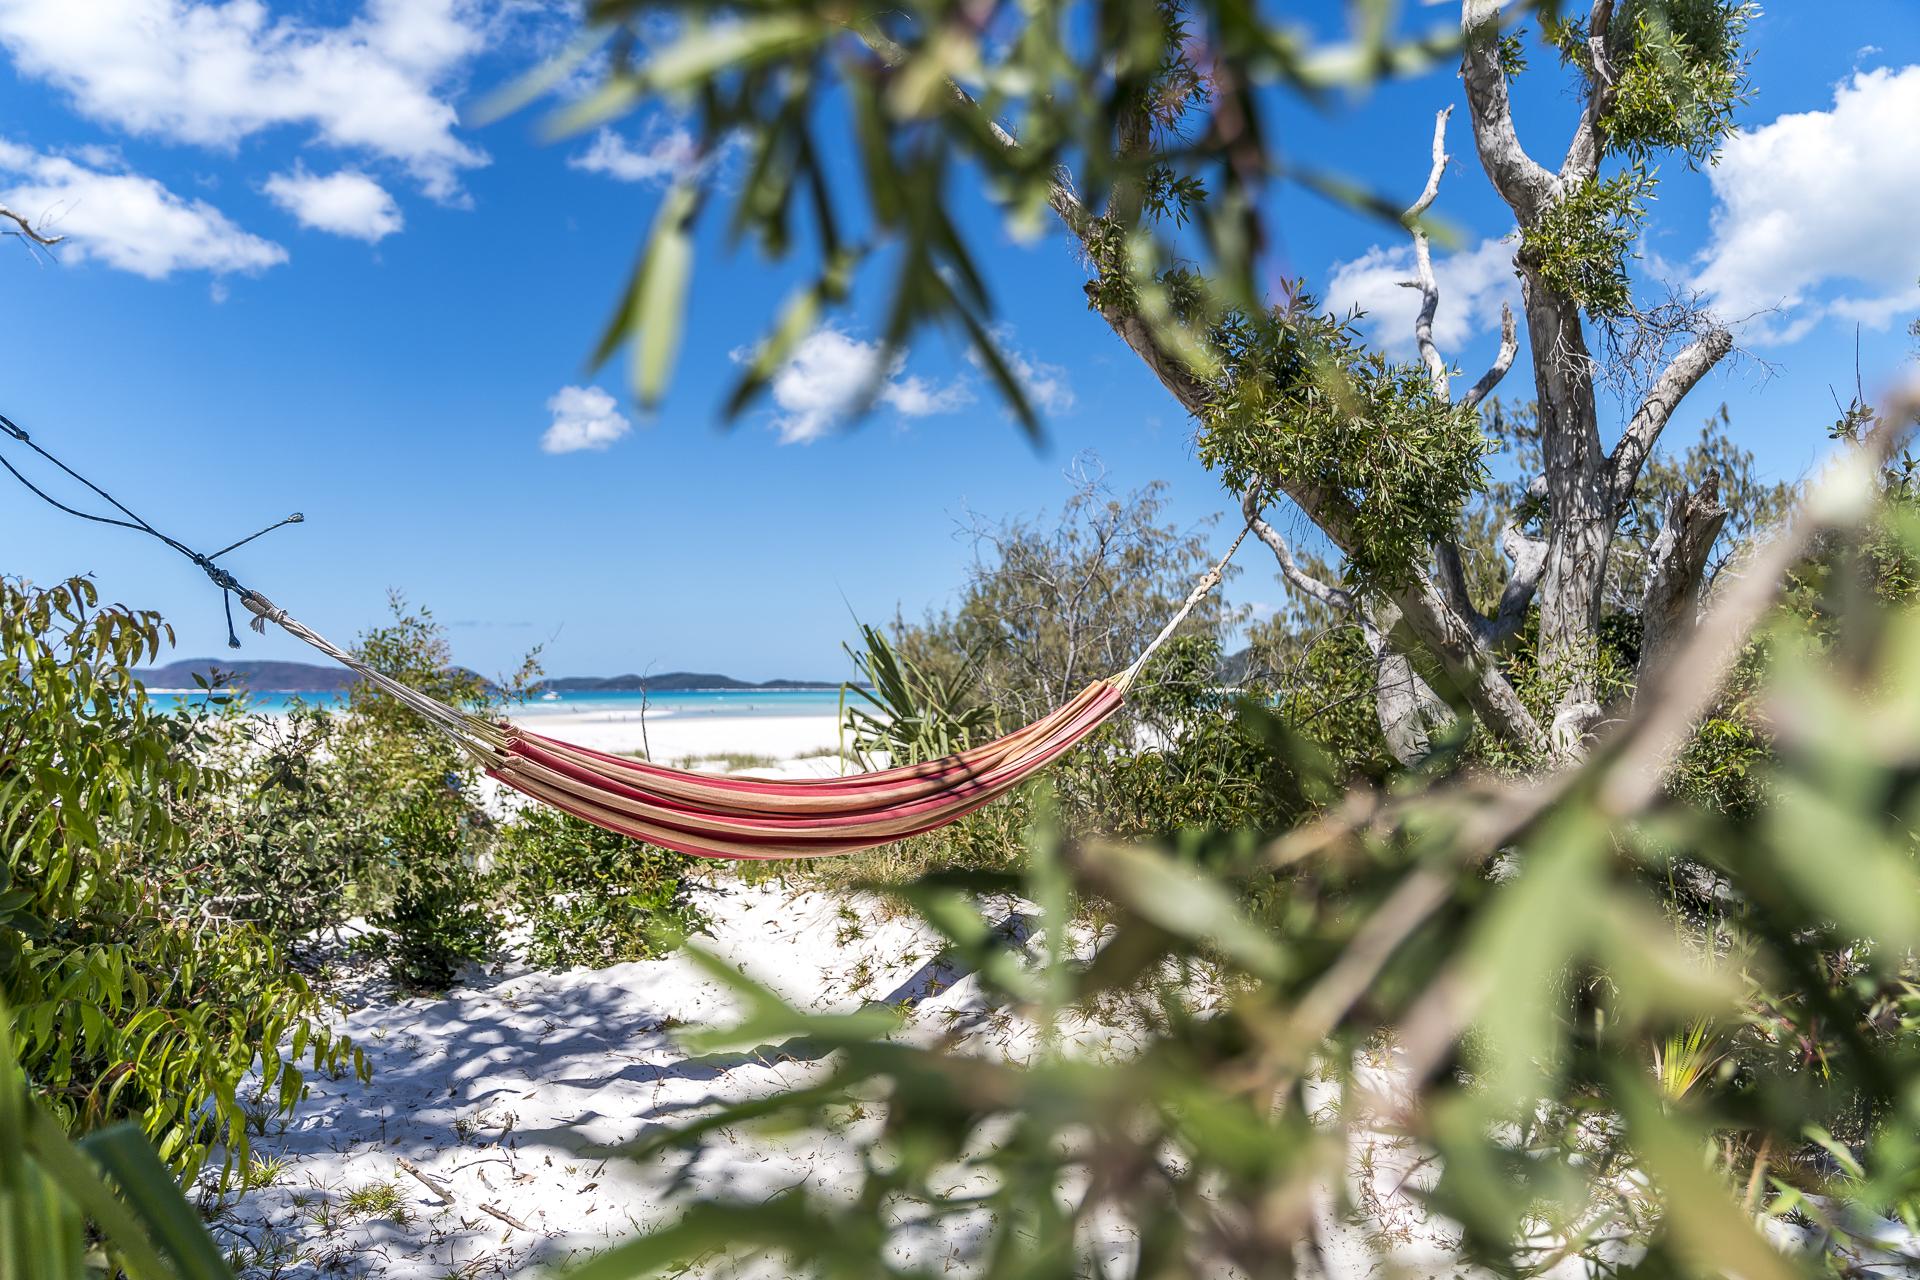 Chilling in Queensland Australia